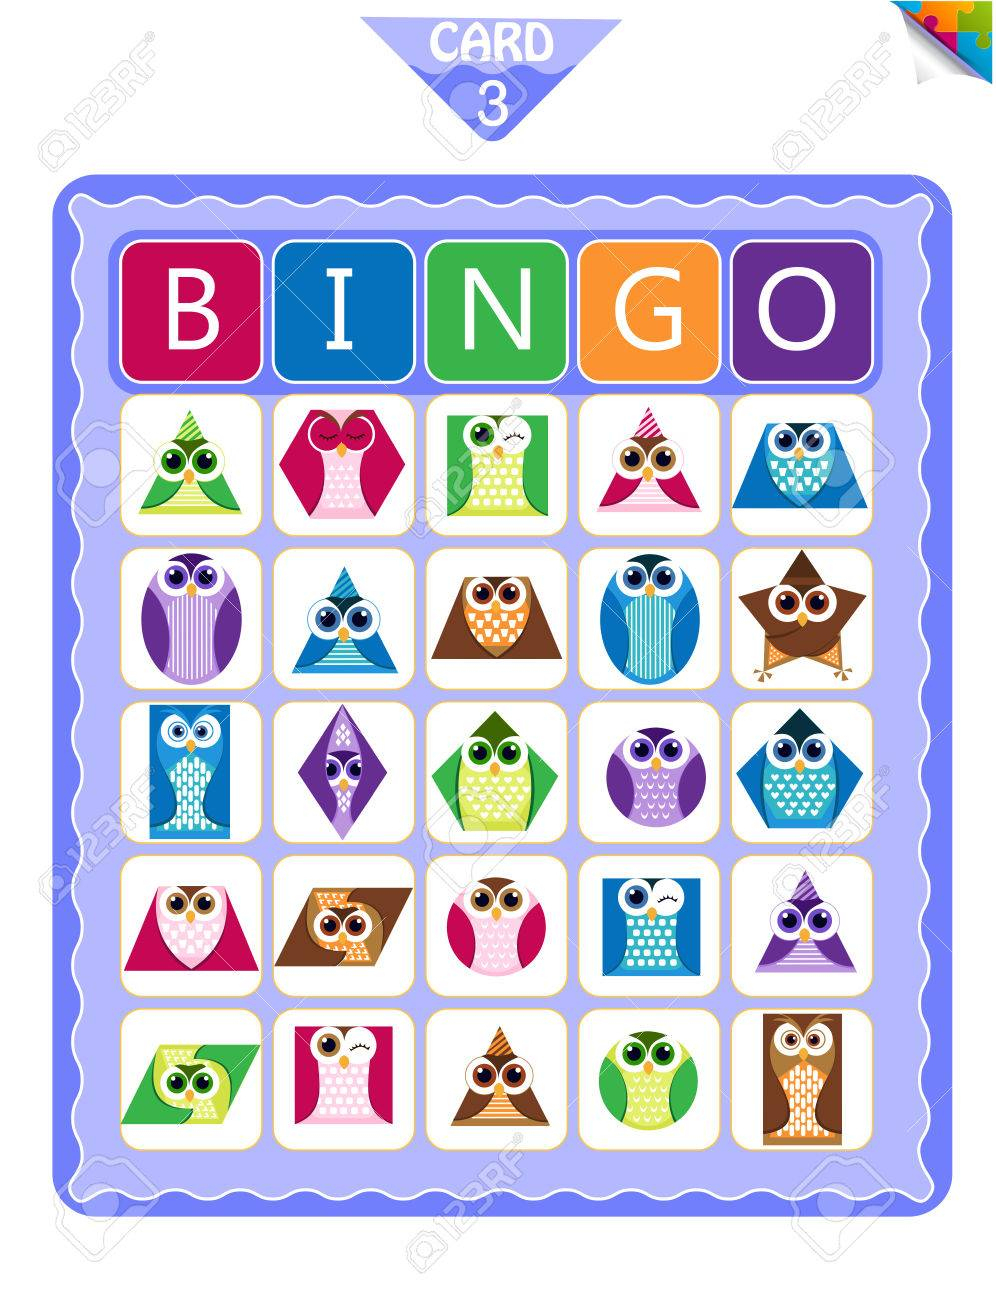 Printable Educational Bingo Game For Preschool Kids With Shapes..